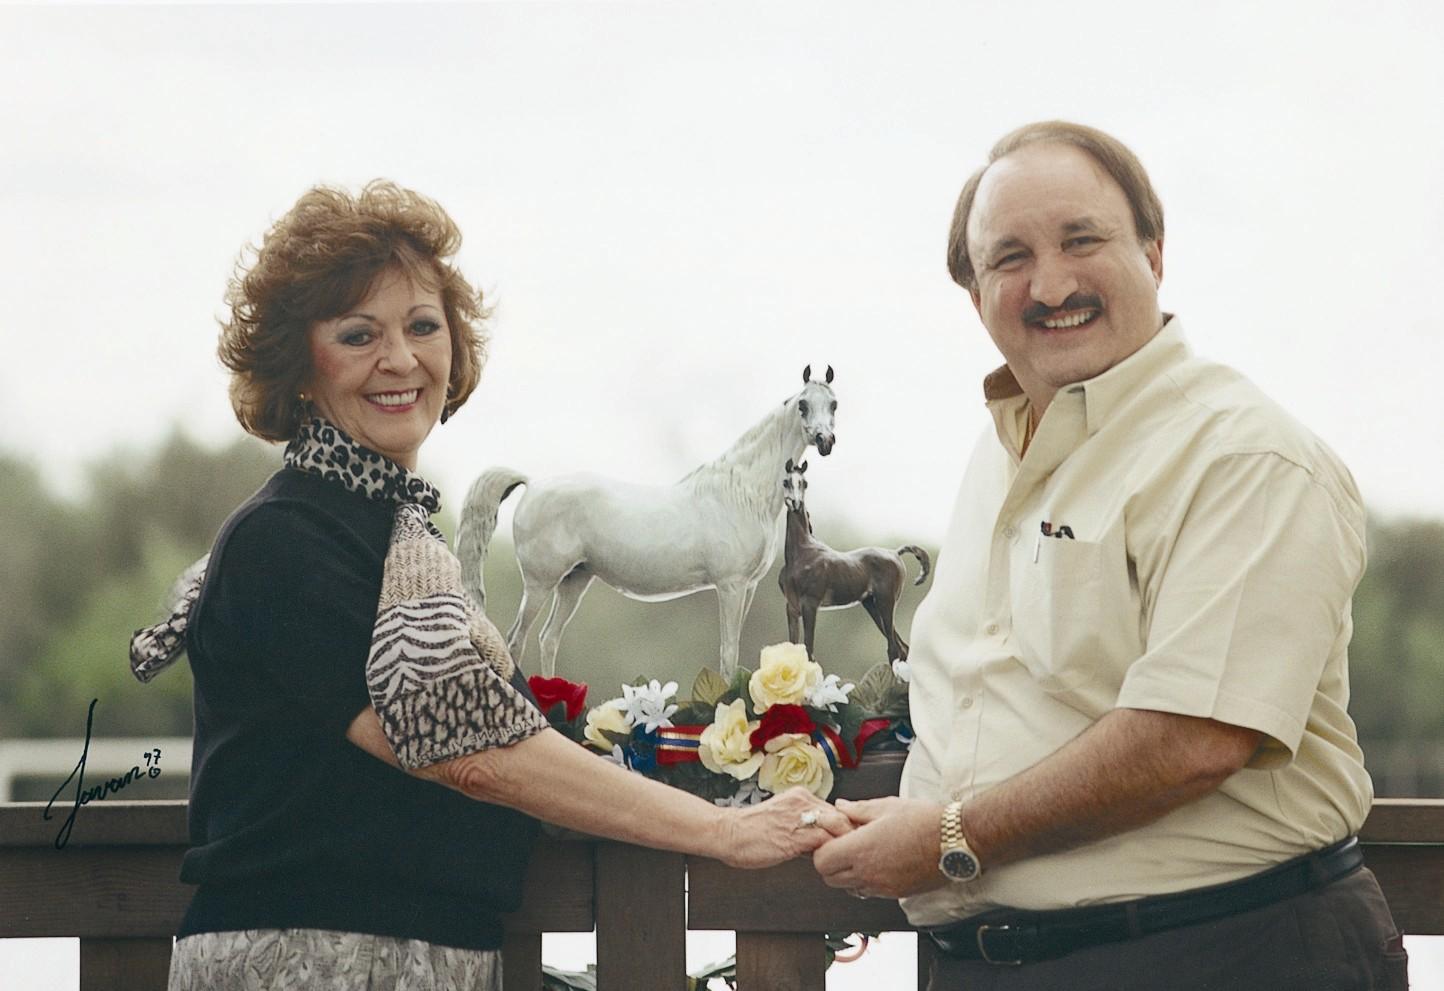 Jim and Judy w Magidaa Imaage bronze